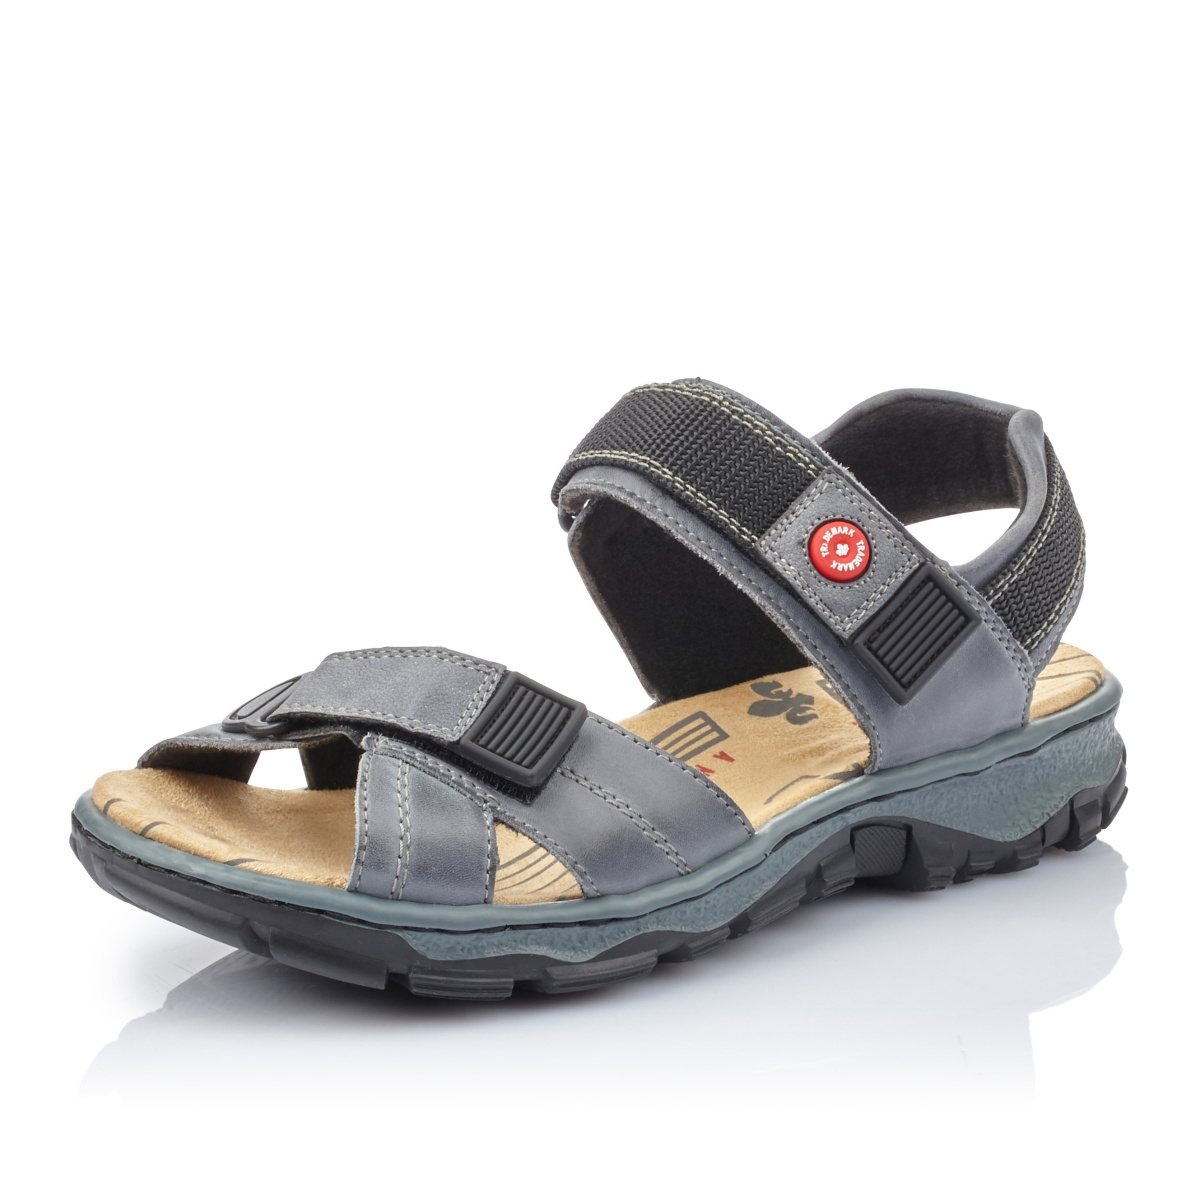 48ede9c674 detail Dámská obuv RIEKER 68851-12 BLAU F S 9